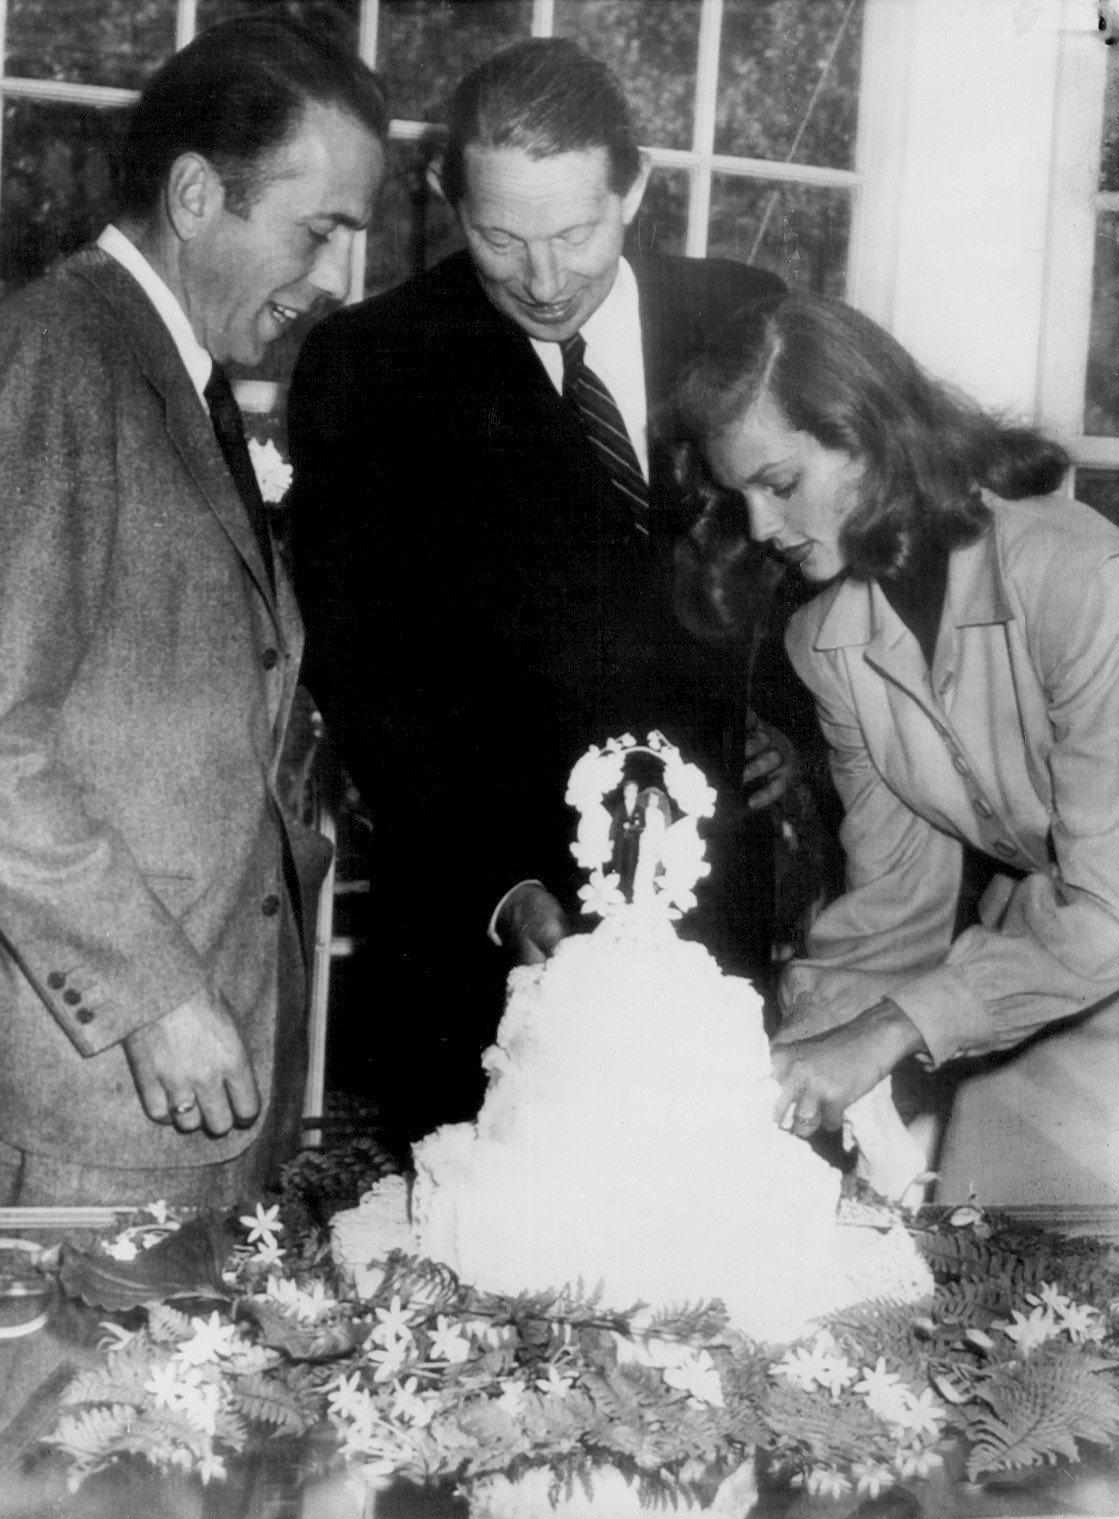 Humphrey Bogart and Lauren Bacall in 1945.   Source: Wikimedia Commons